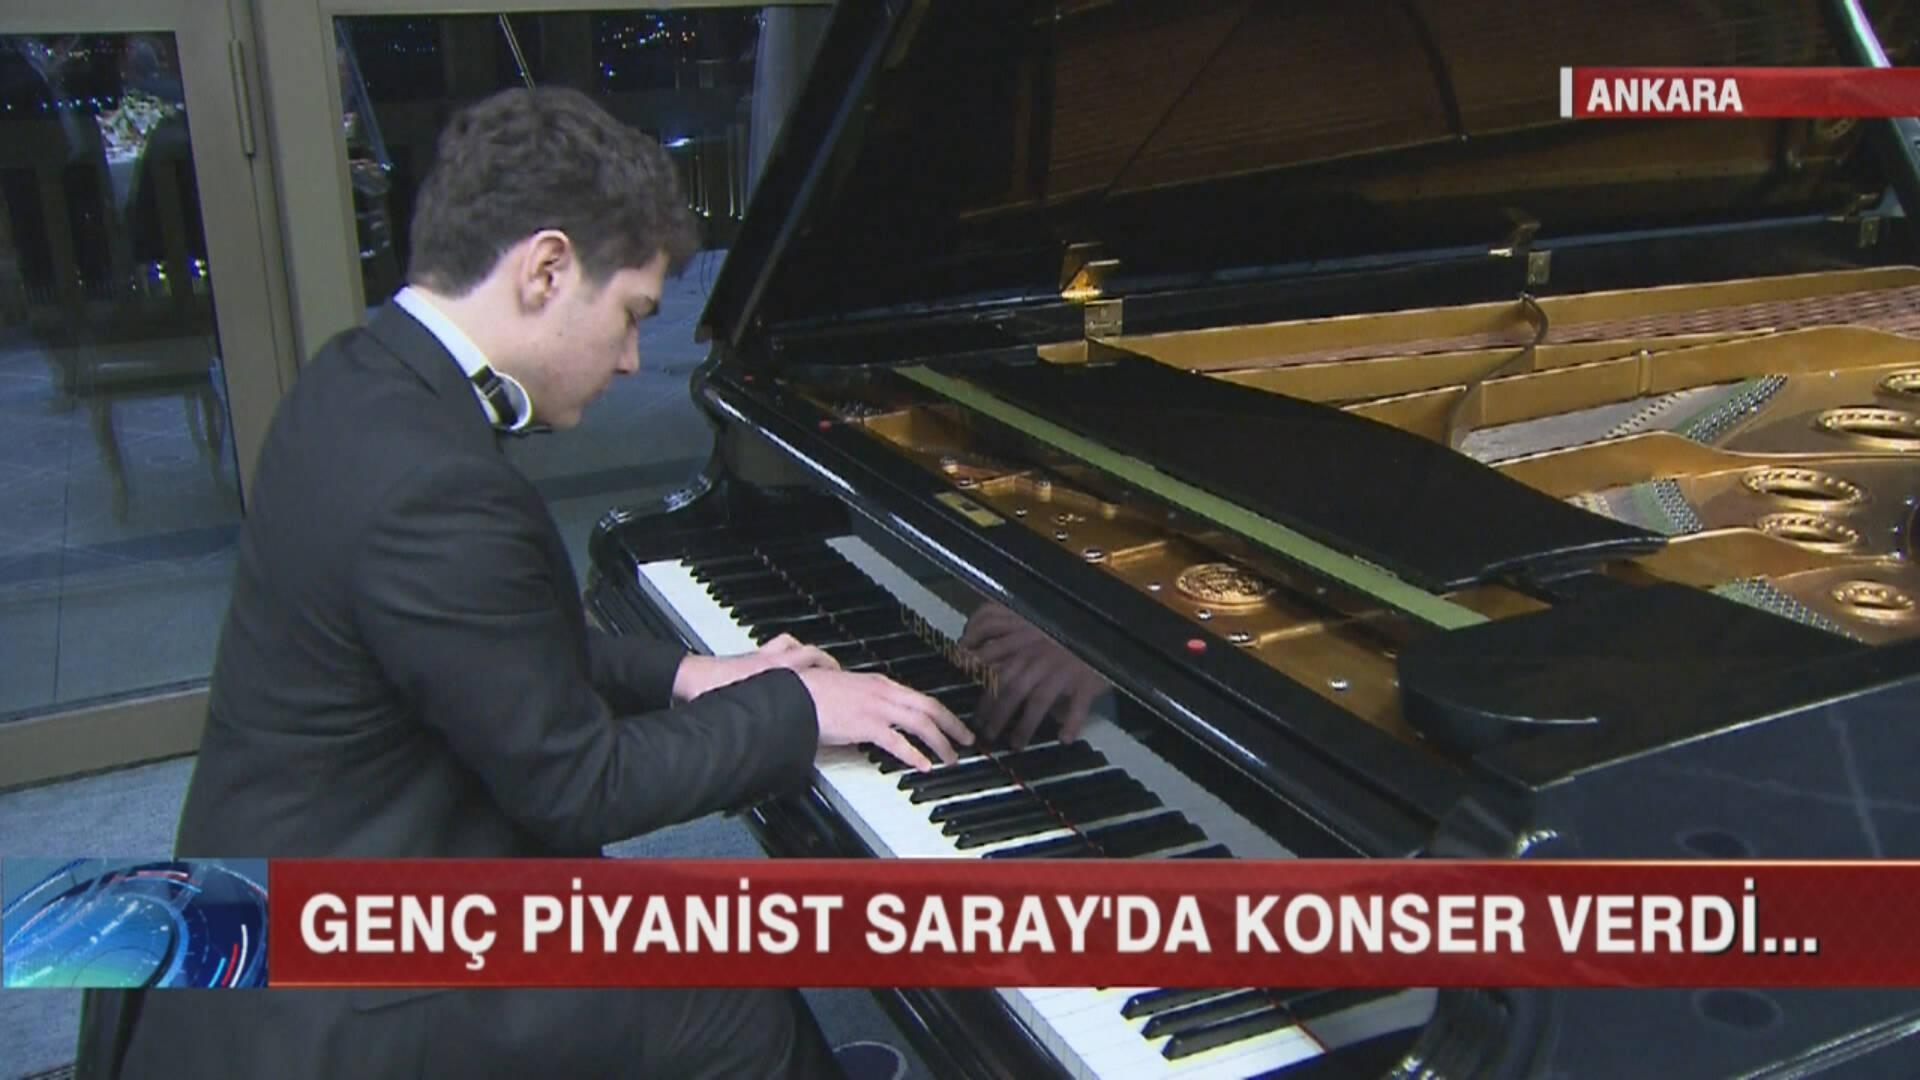 Genç piyanist sarayda konser verdi!